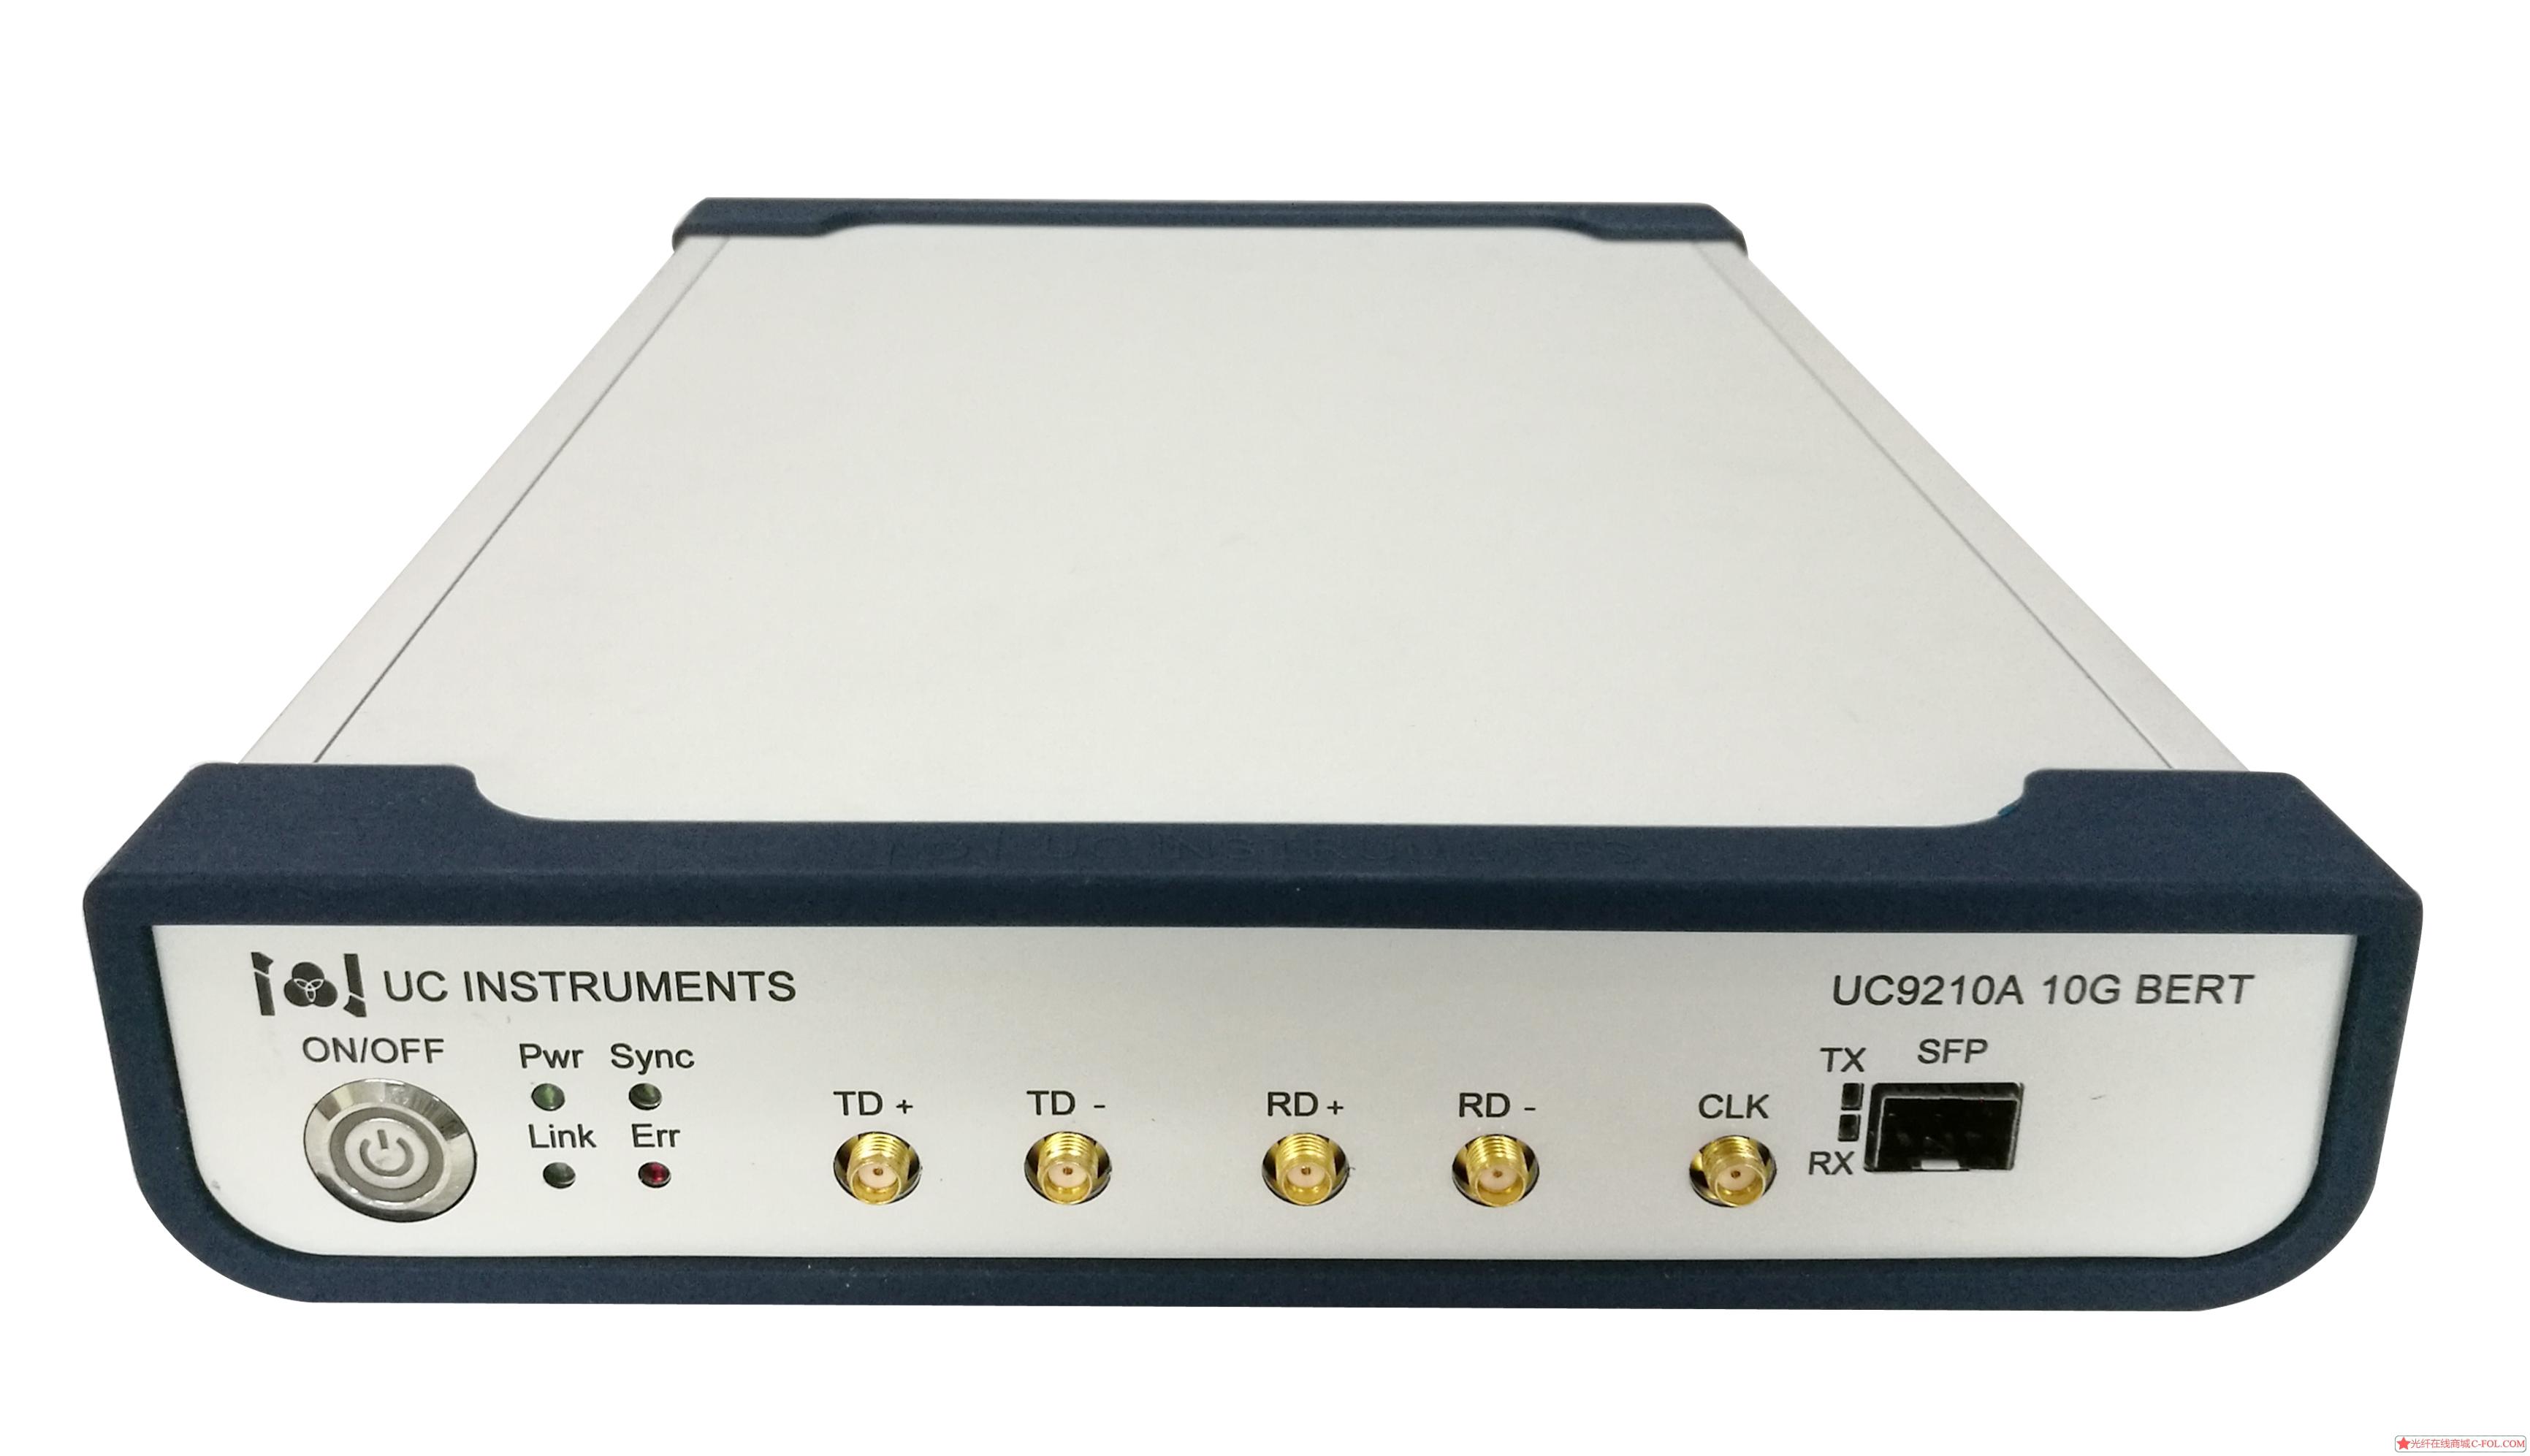 UC9210A 10G Full Rate BERT全速率误码仪